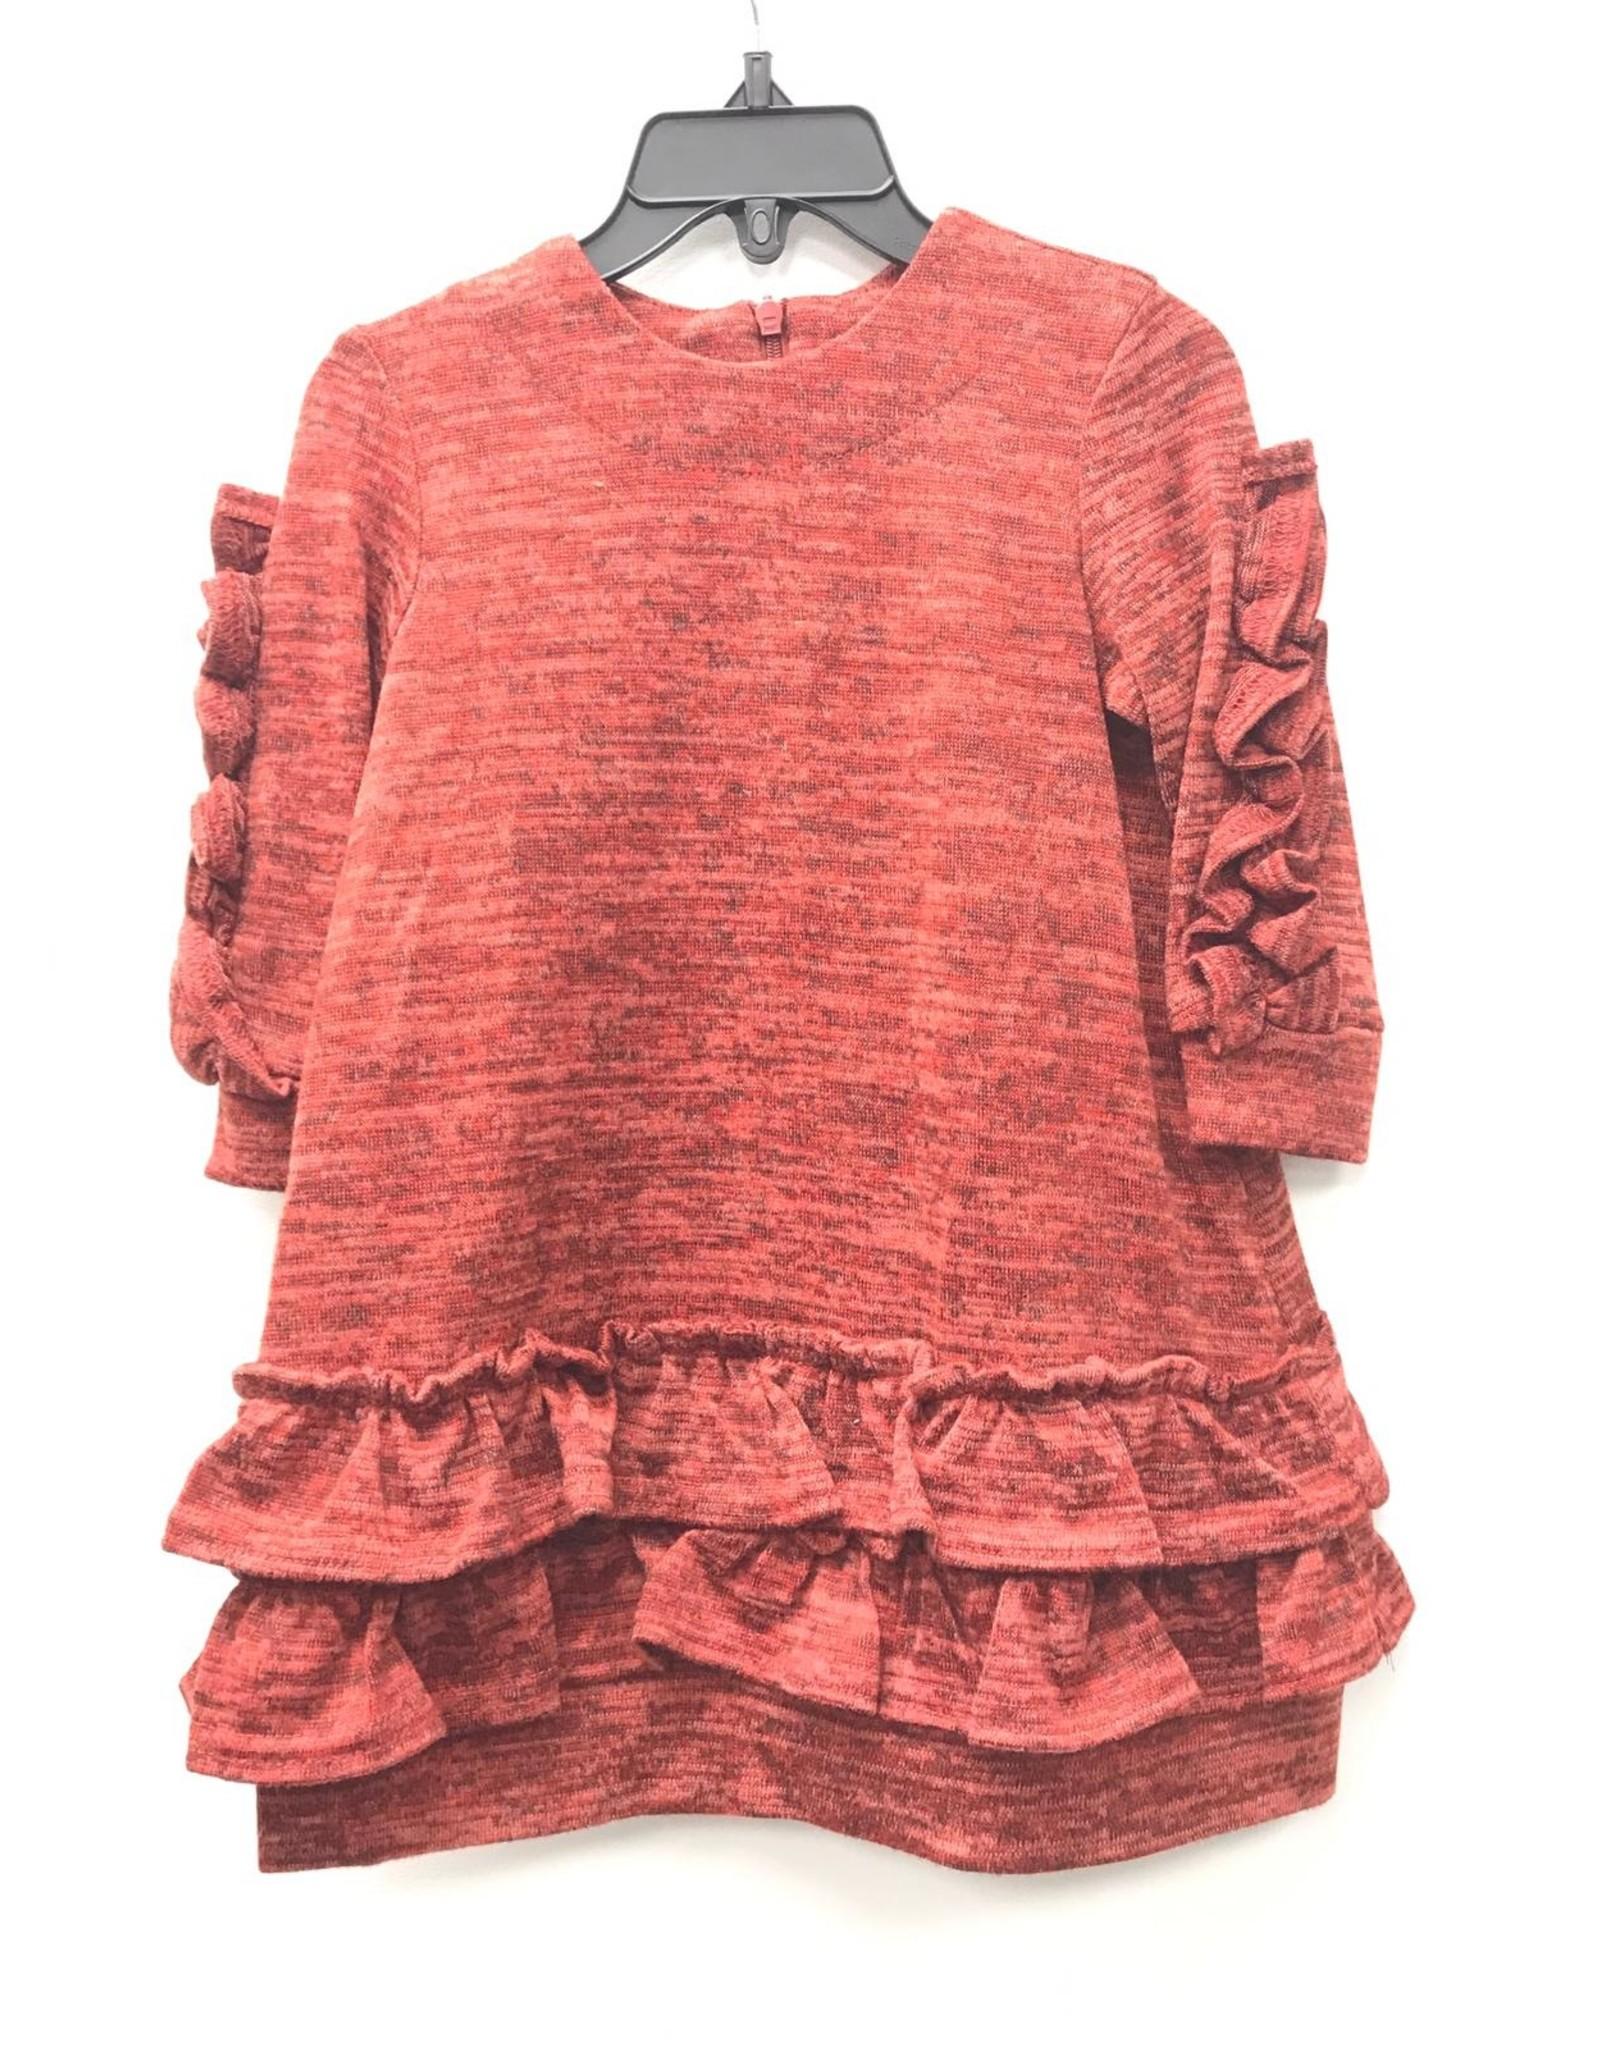 GIRL GIRL Sweaterknit Dress with Ruffles on Sleeves